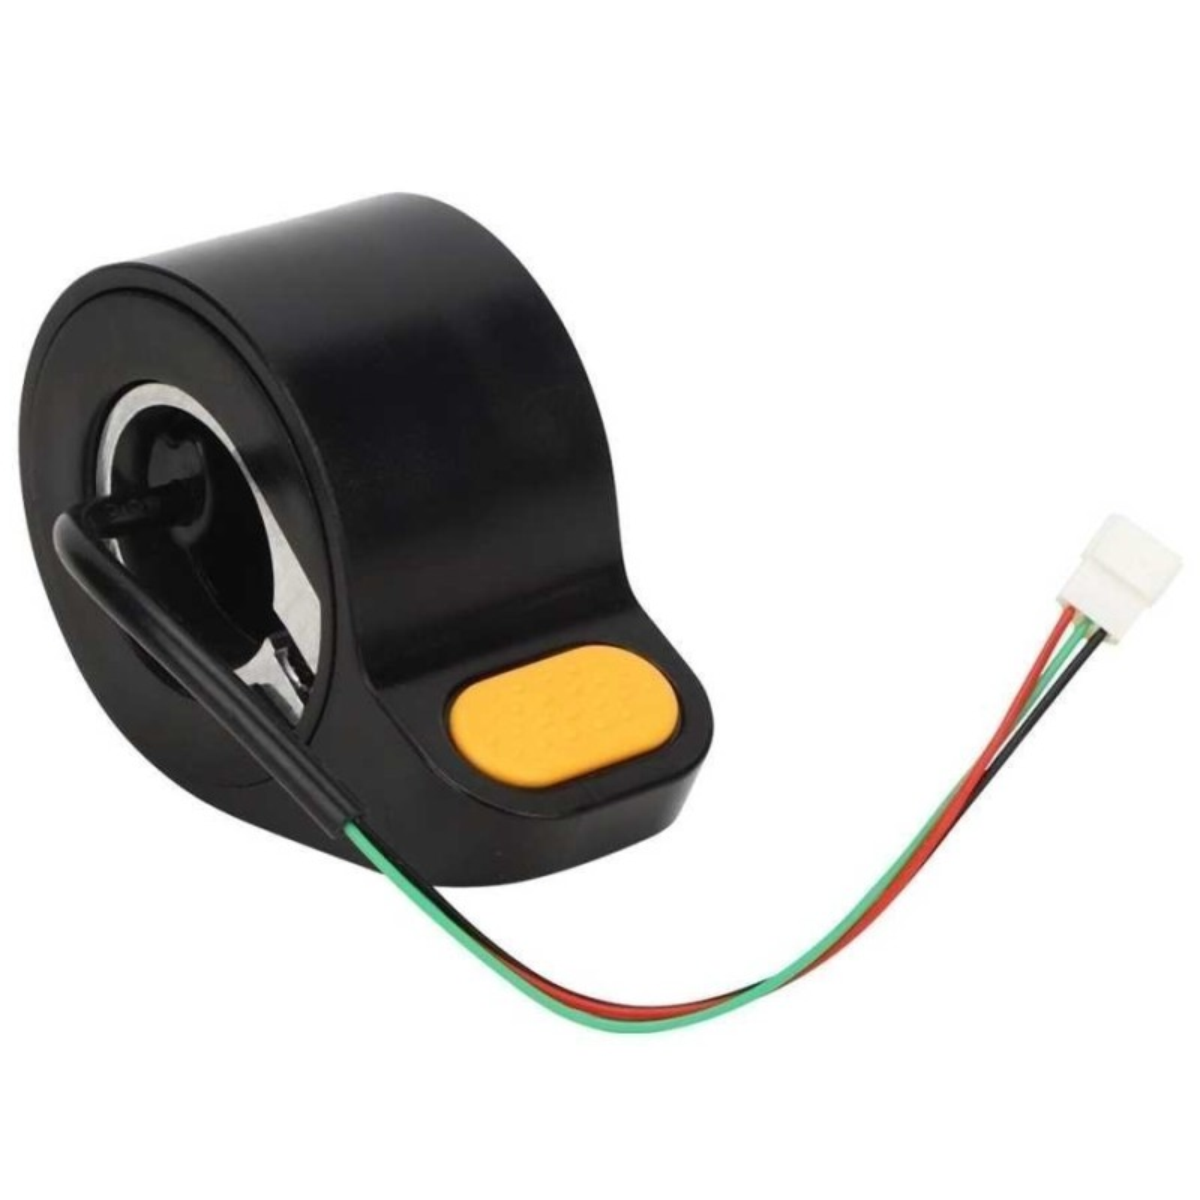 Acelerador para patinete Ninebot Max G30